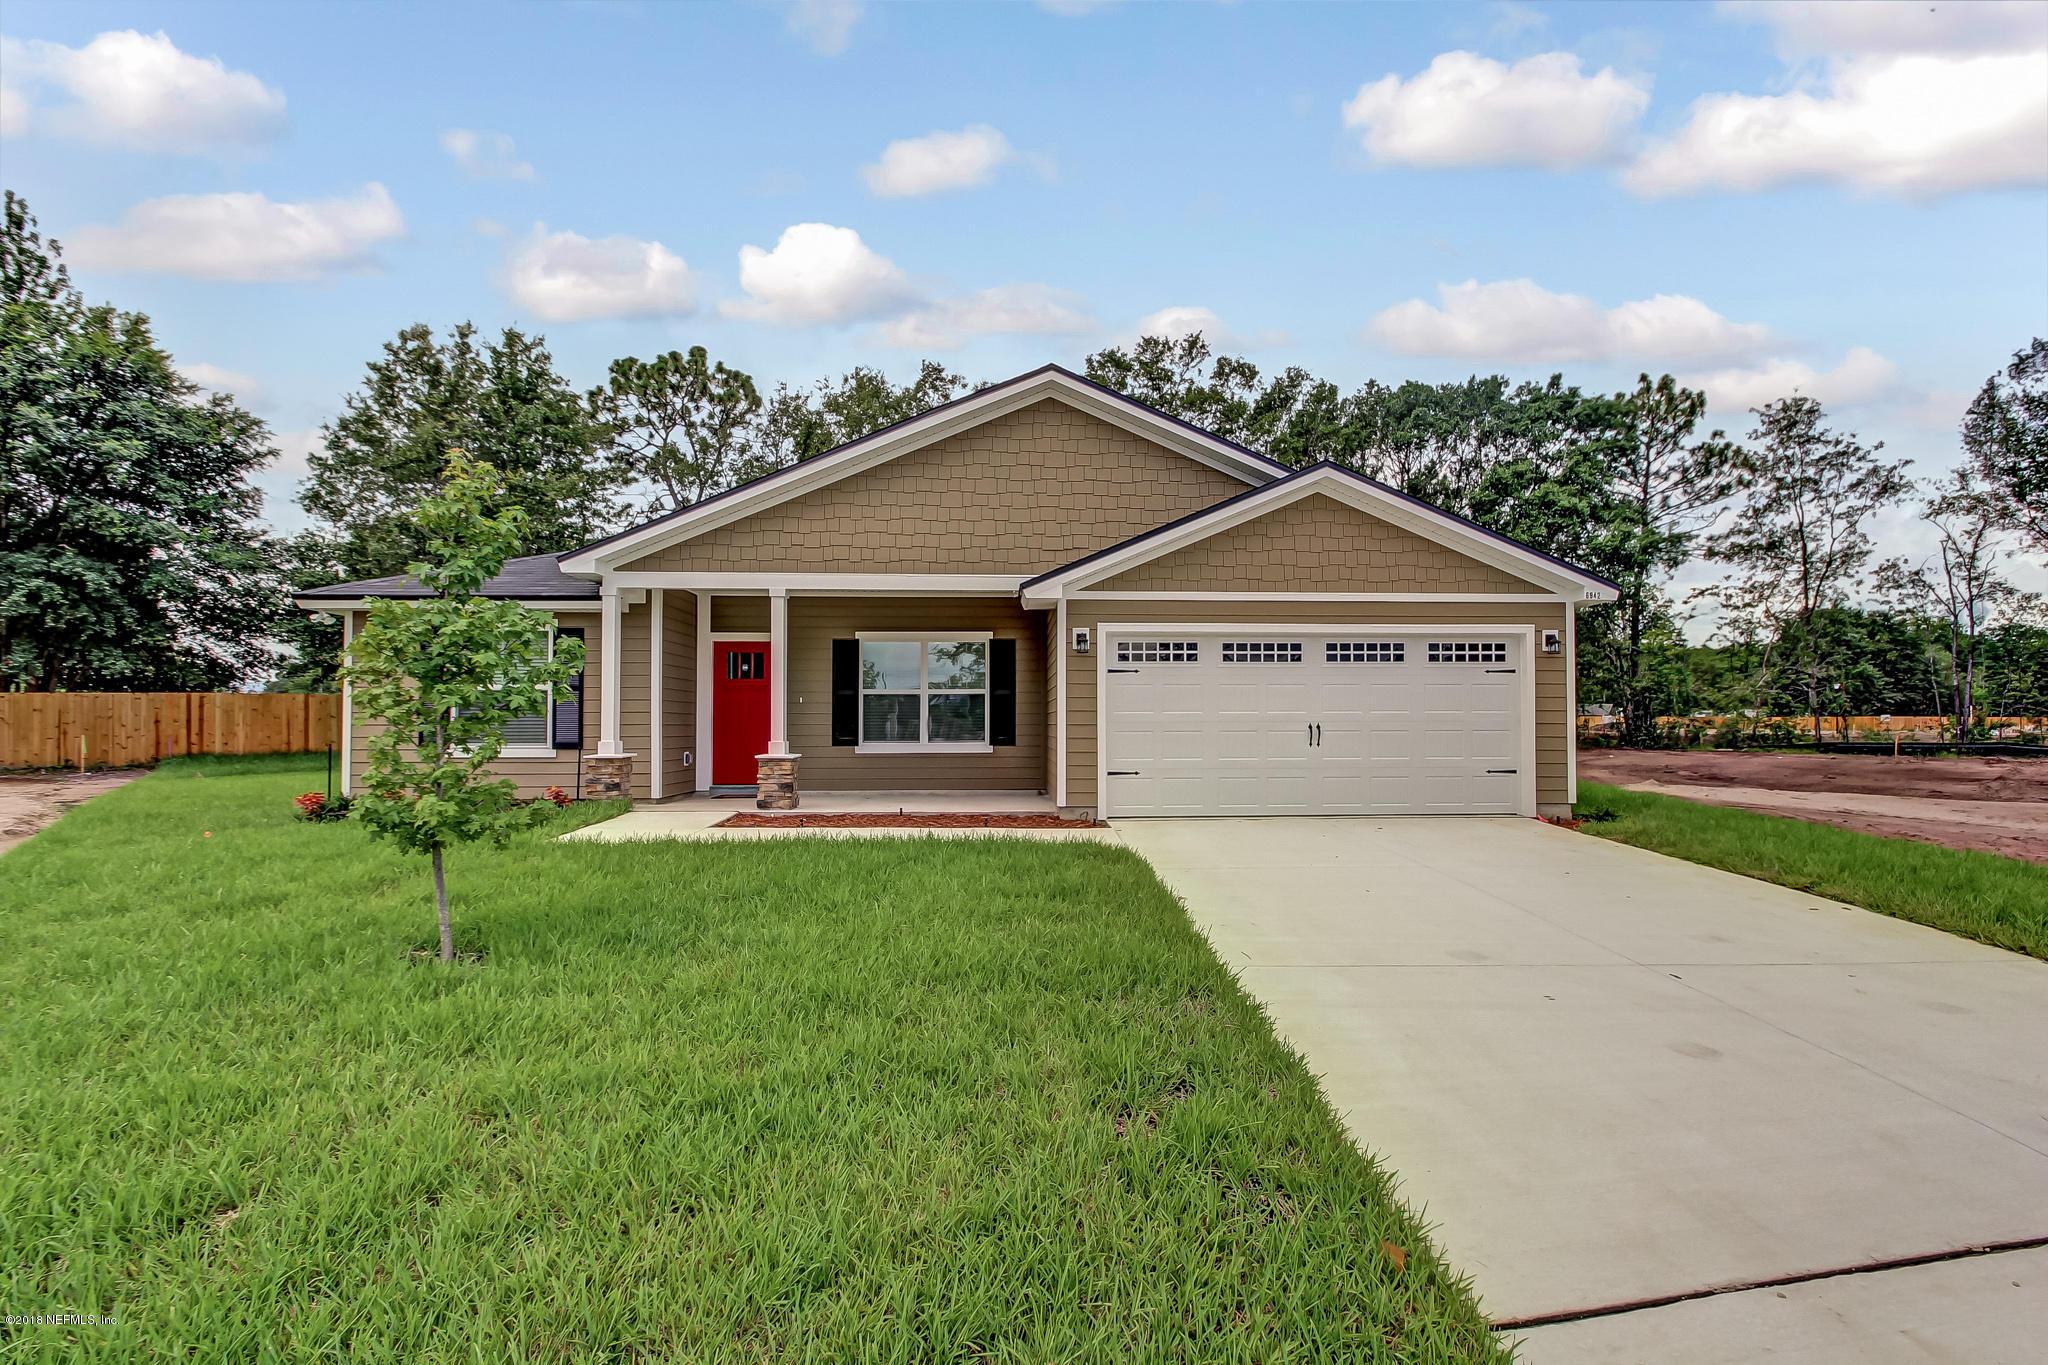 8765 KAYE, JACKSONVILLE, FLORIDA 32222, 4 Bedrooms Bedrooms, ,2 BathroomsBathrooms,Residential - single family,For sale,KAYE,957466